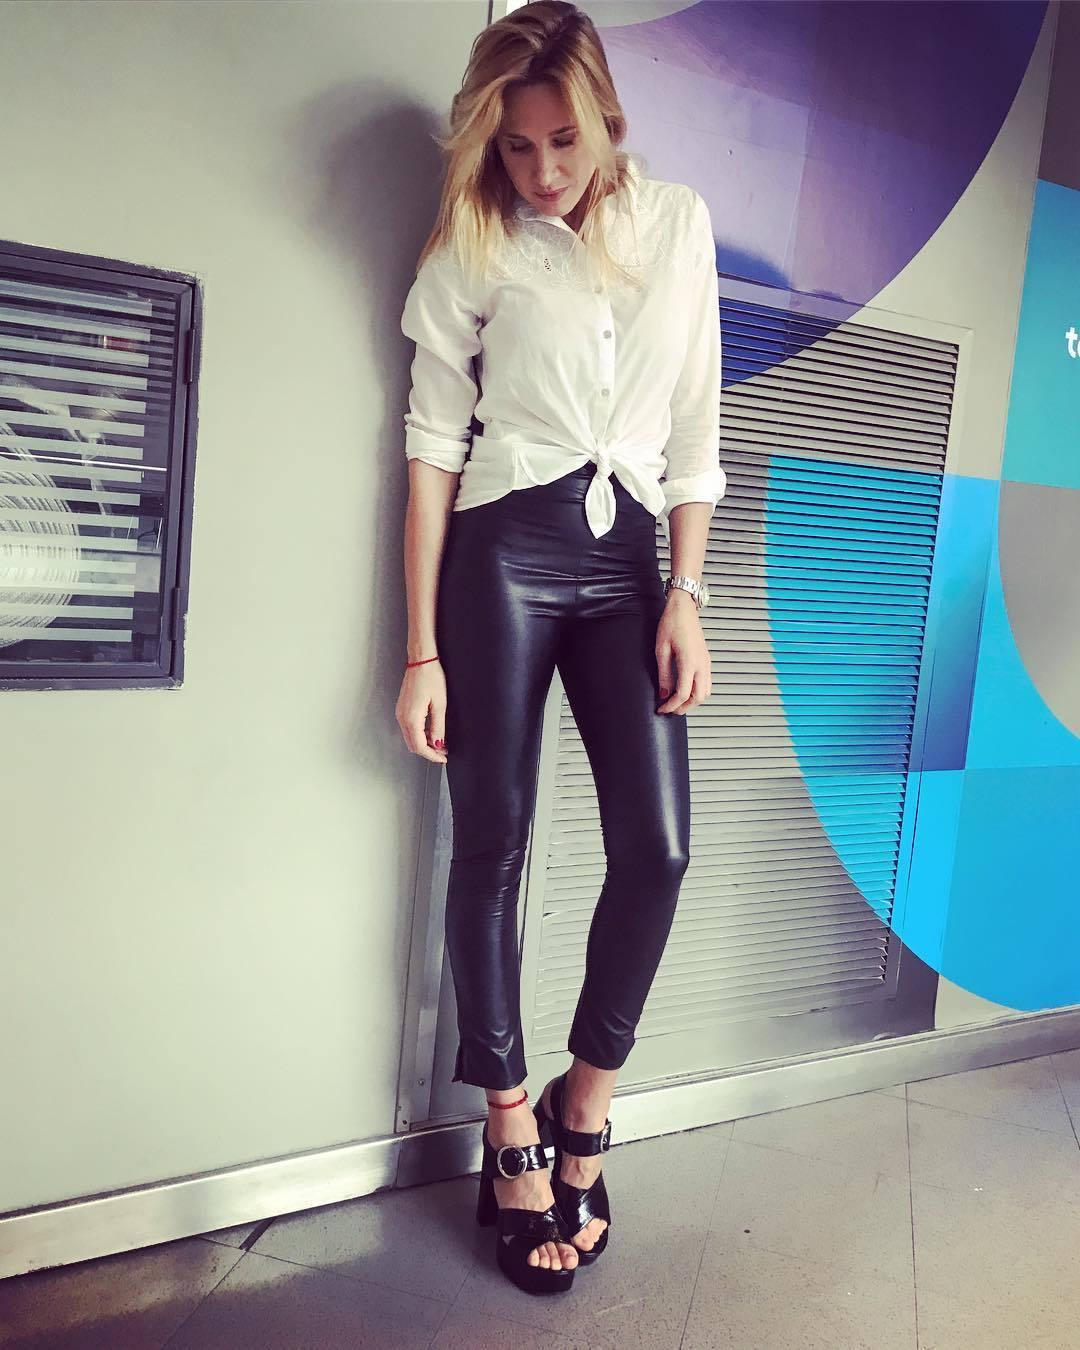 Alina-Moine-Feet-3383078.jpg